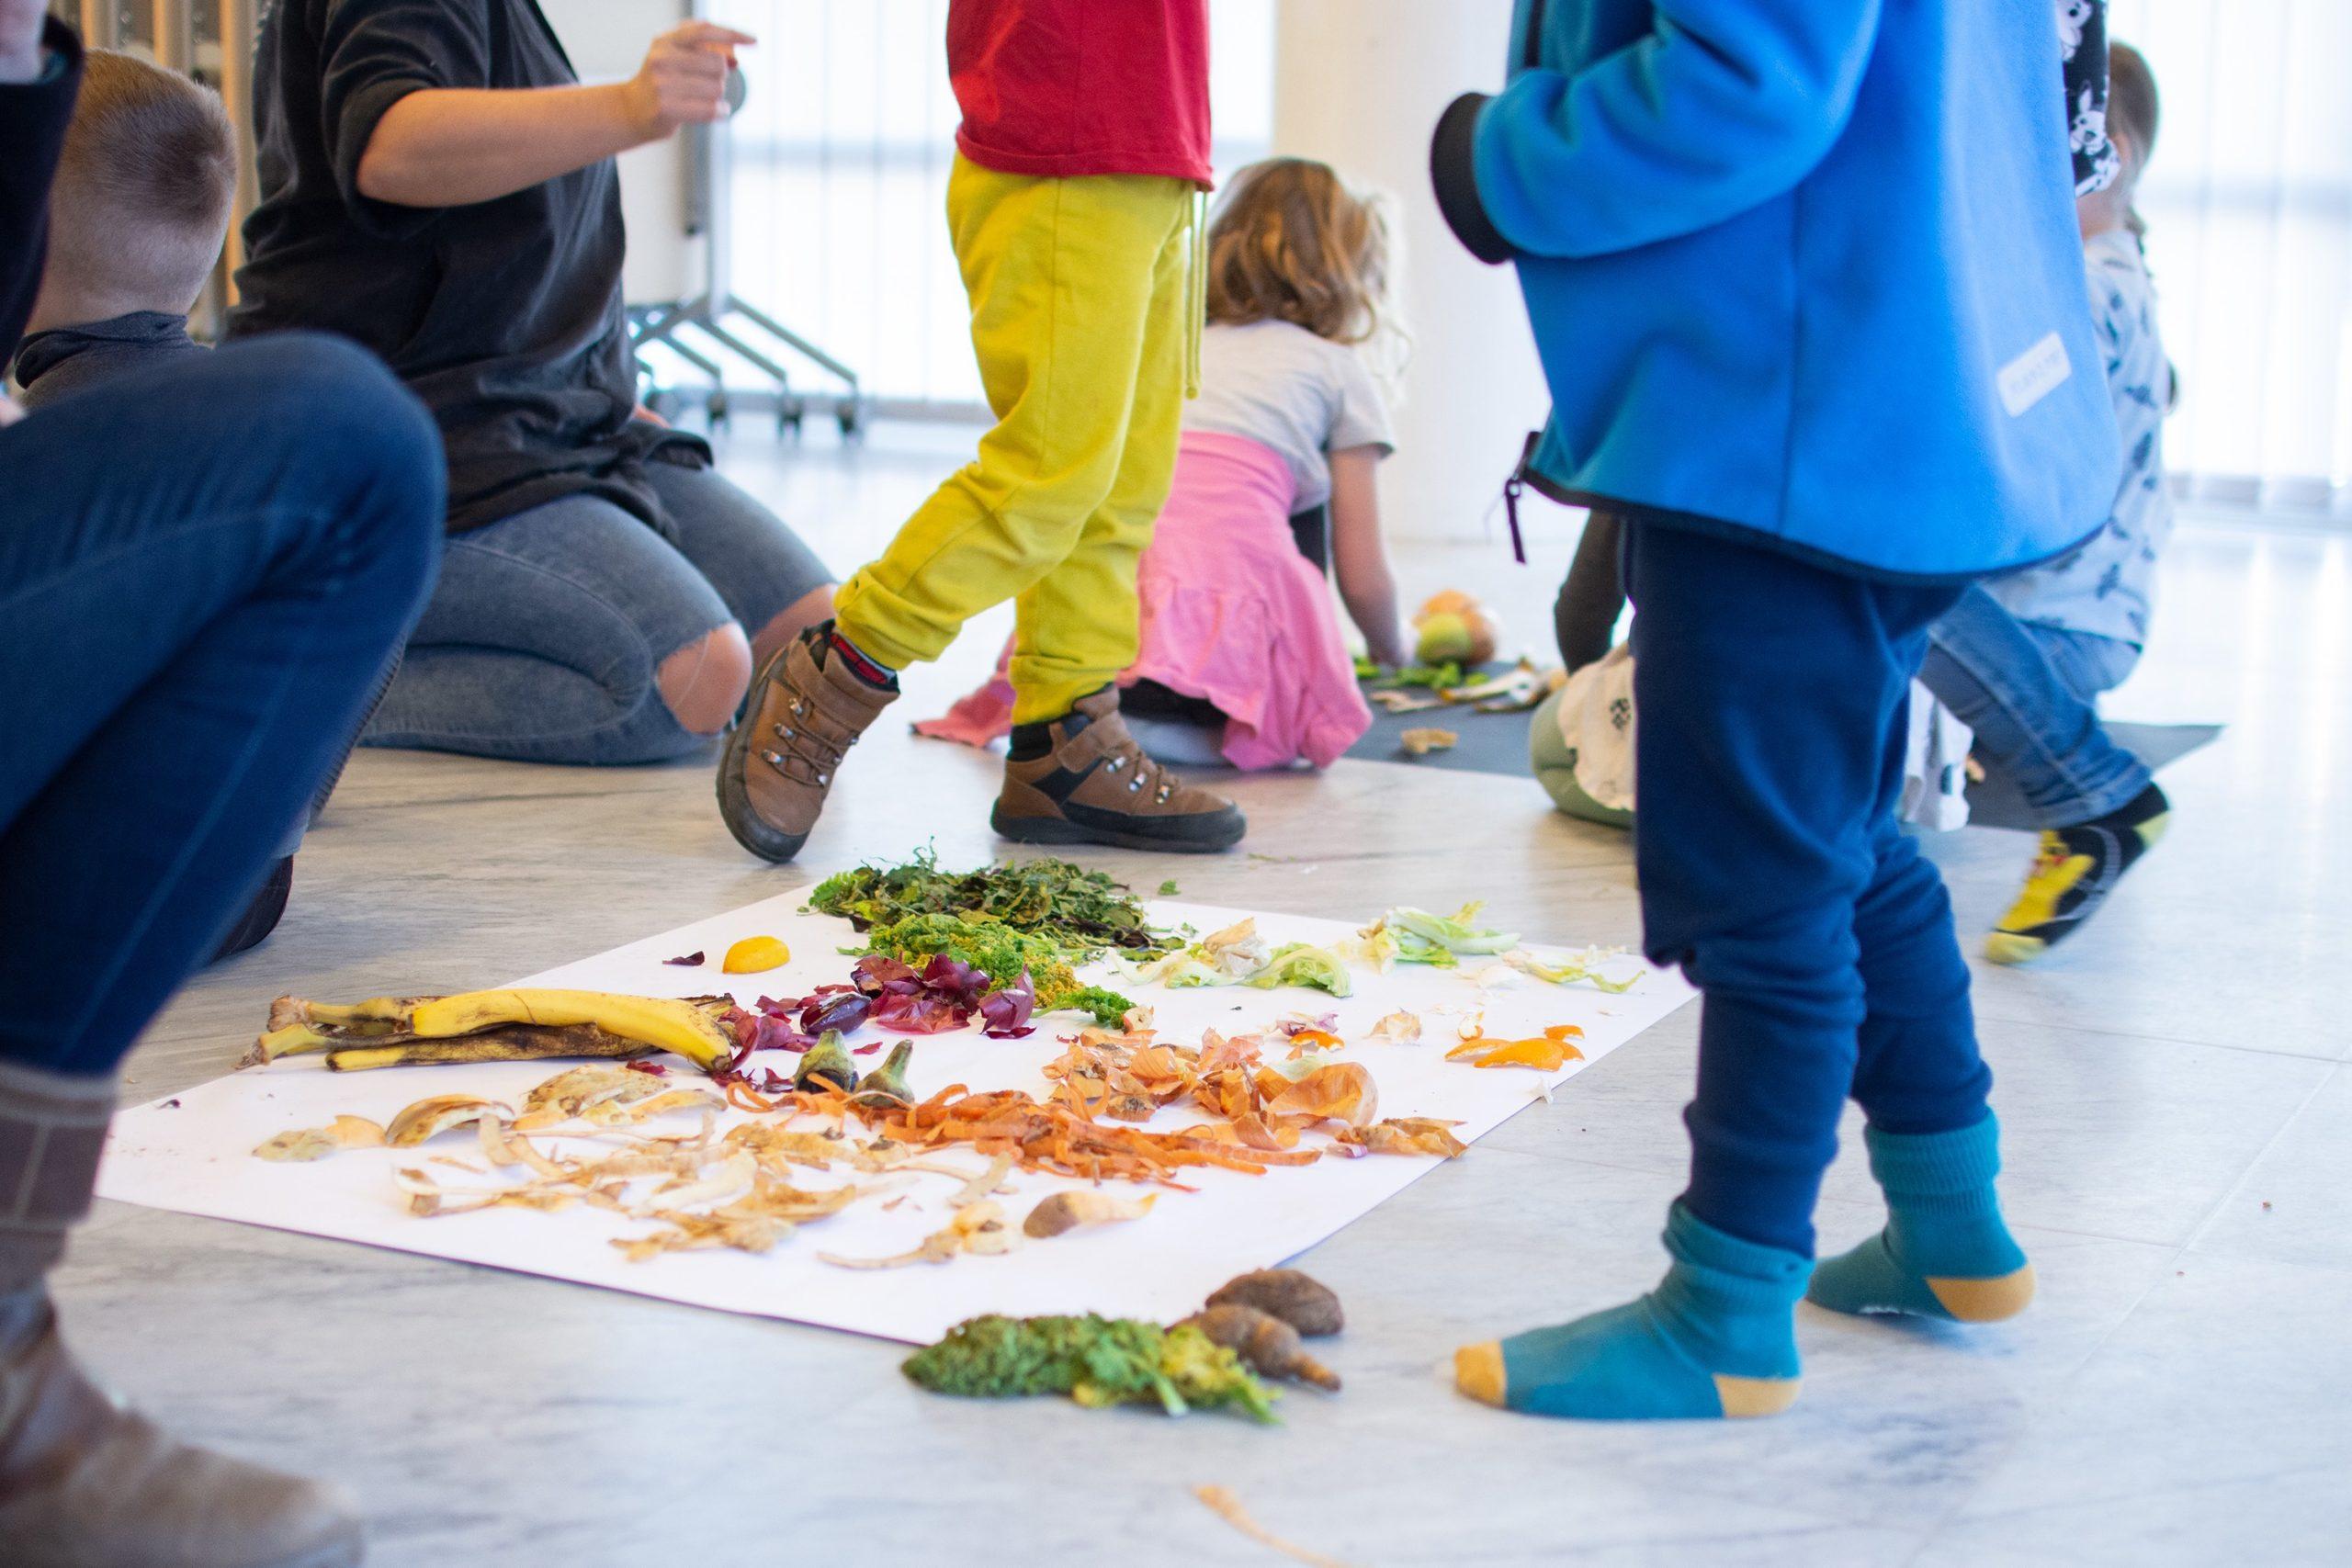 Barnben som står runt ett papper som ligger på golvet med olika matrester på.